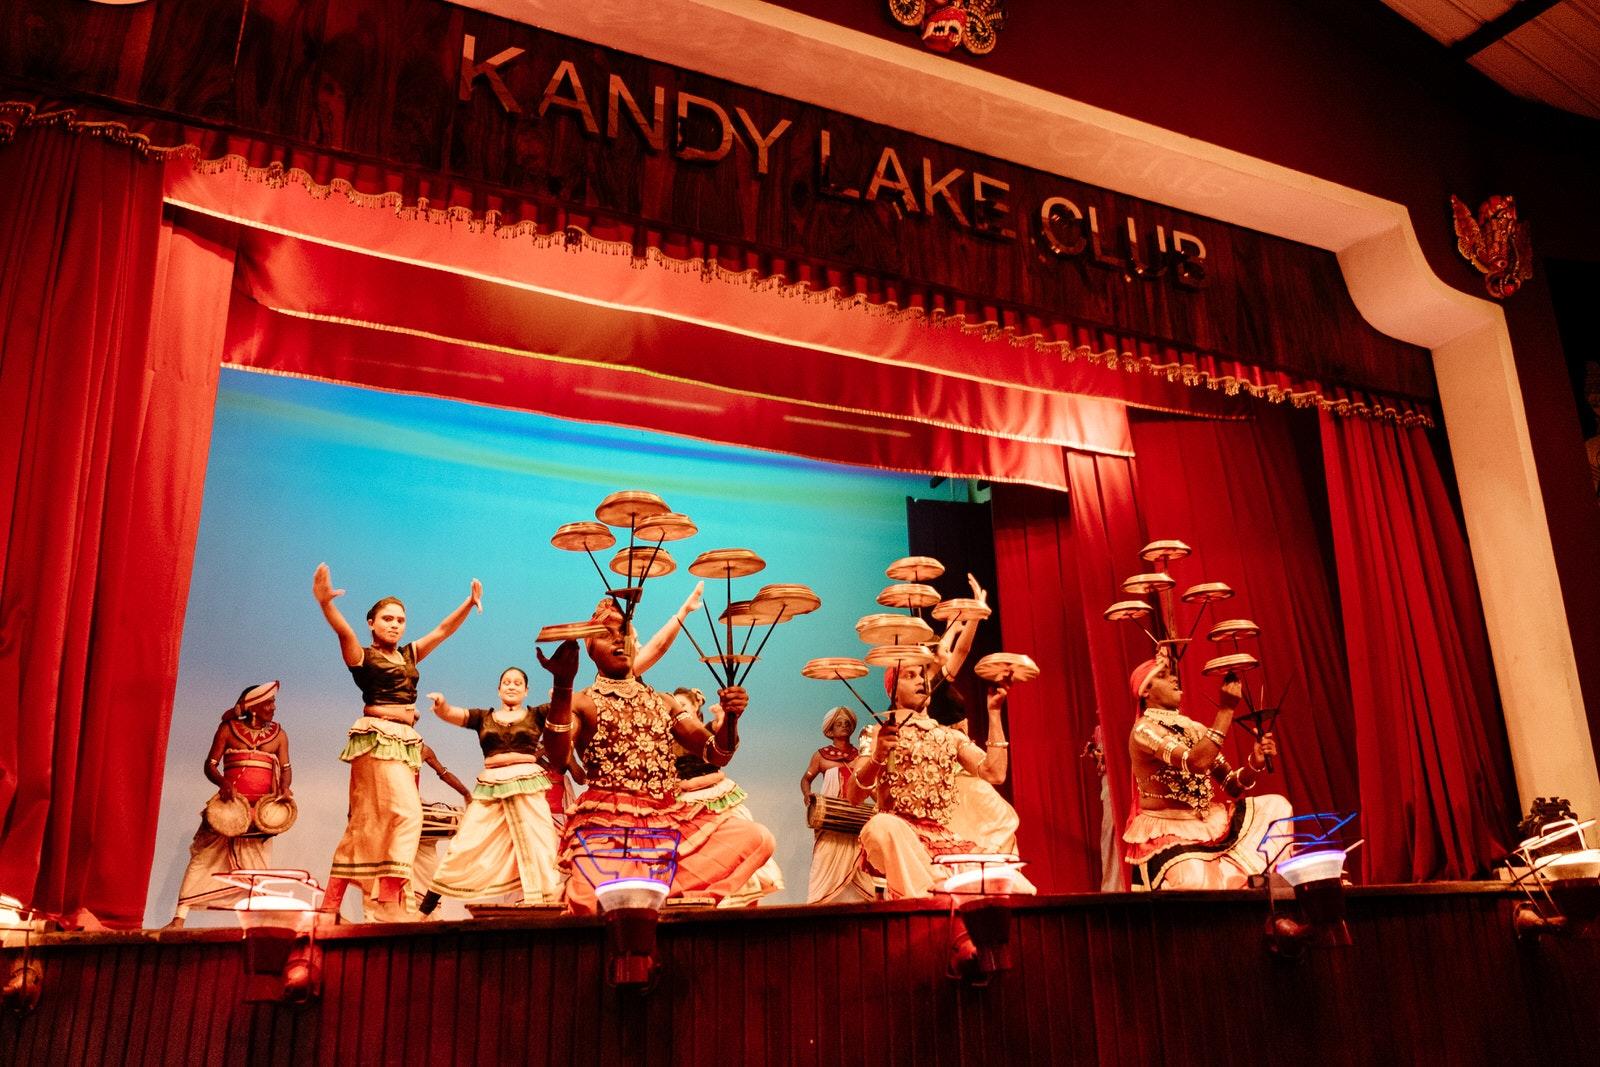 Diamond Bullet - Kandy Lake Club